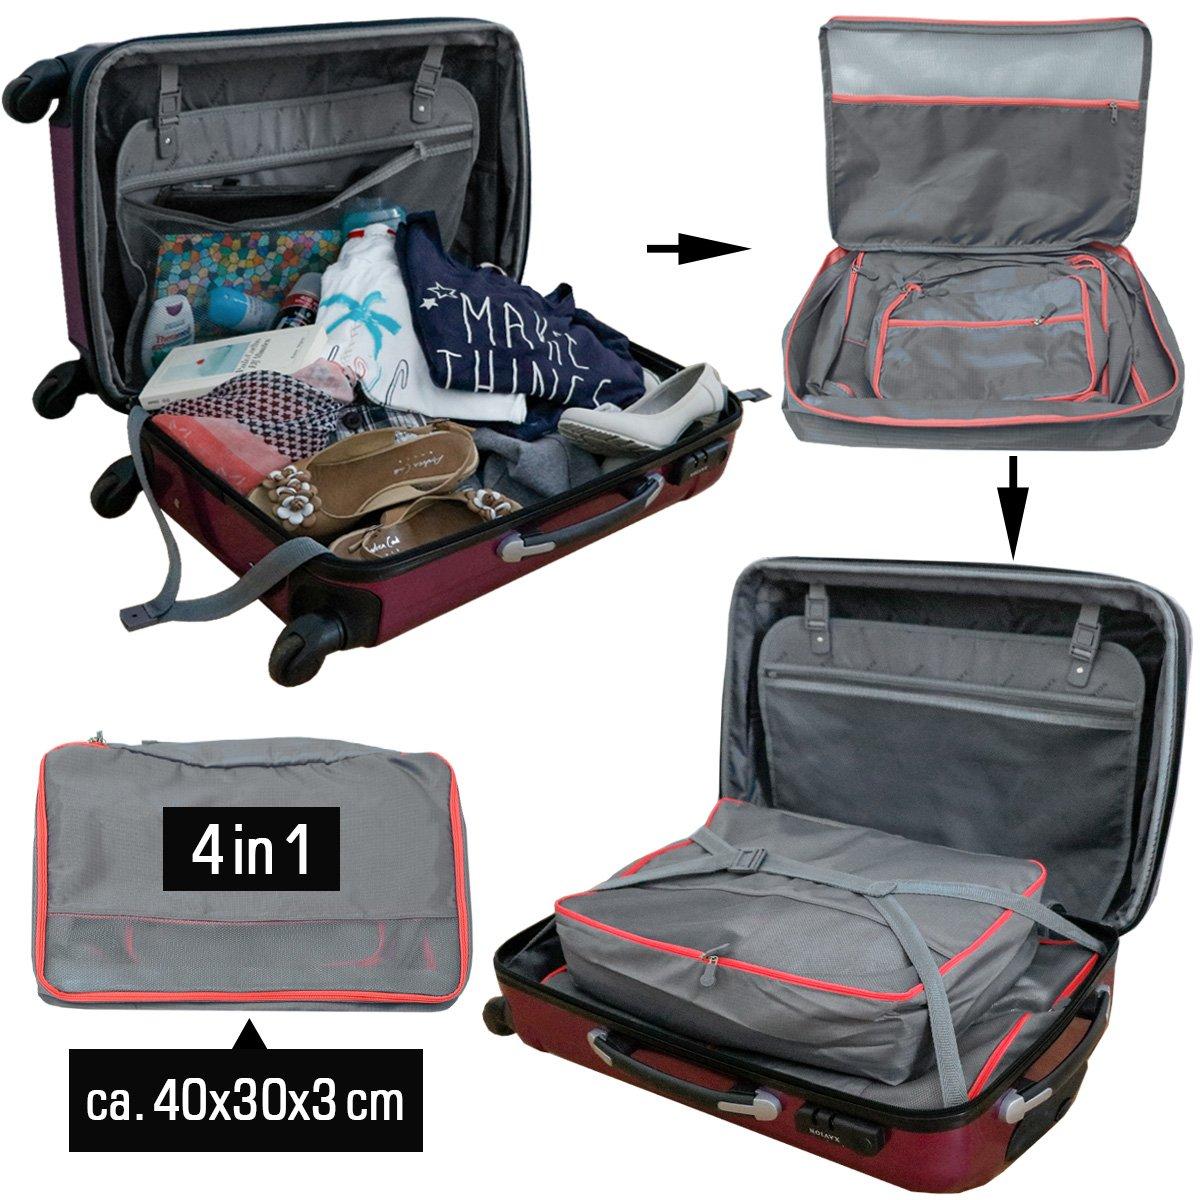 9441a060d7 eyepower 4 Organizer per Valigie S-XL set di sacche di tela rettangolari  Grigio: Amazon.it: Valigeria